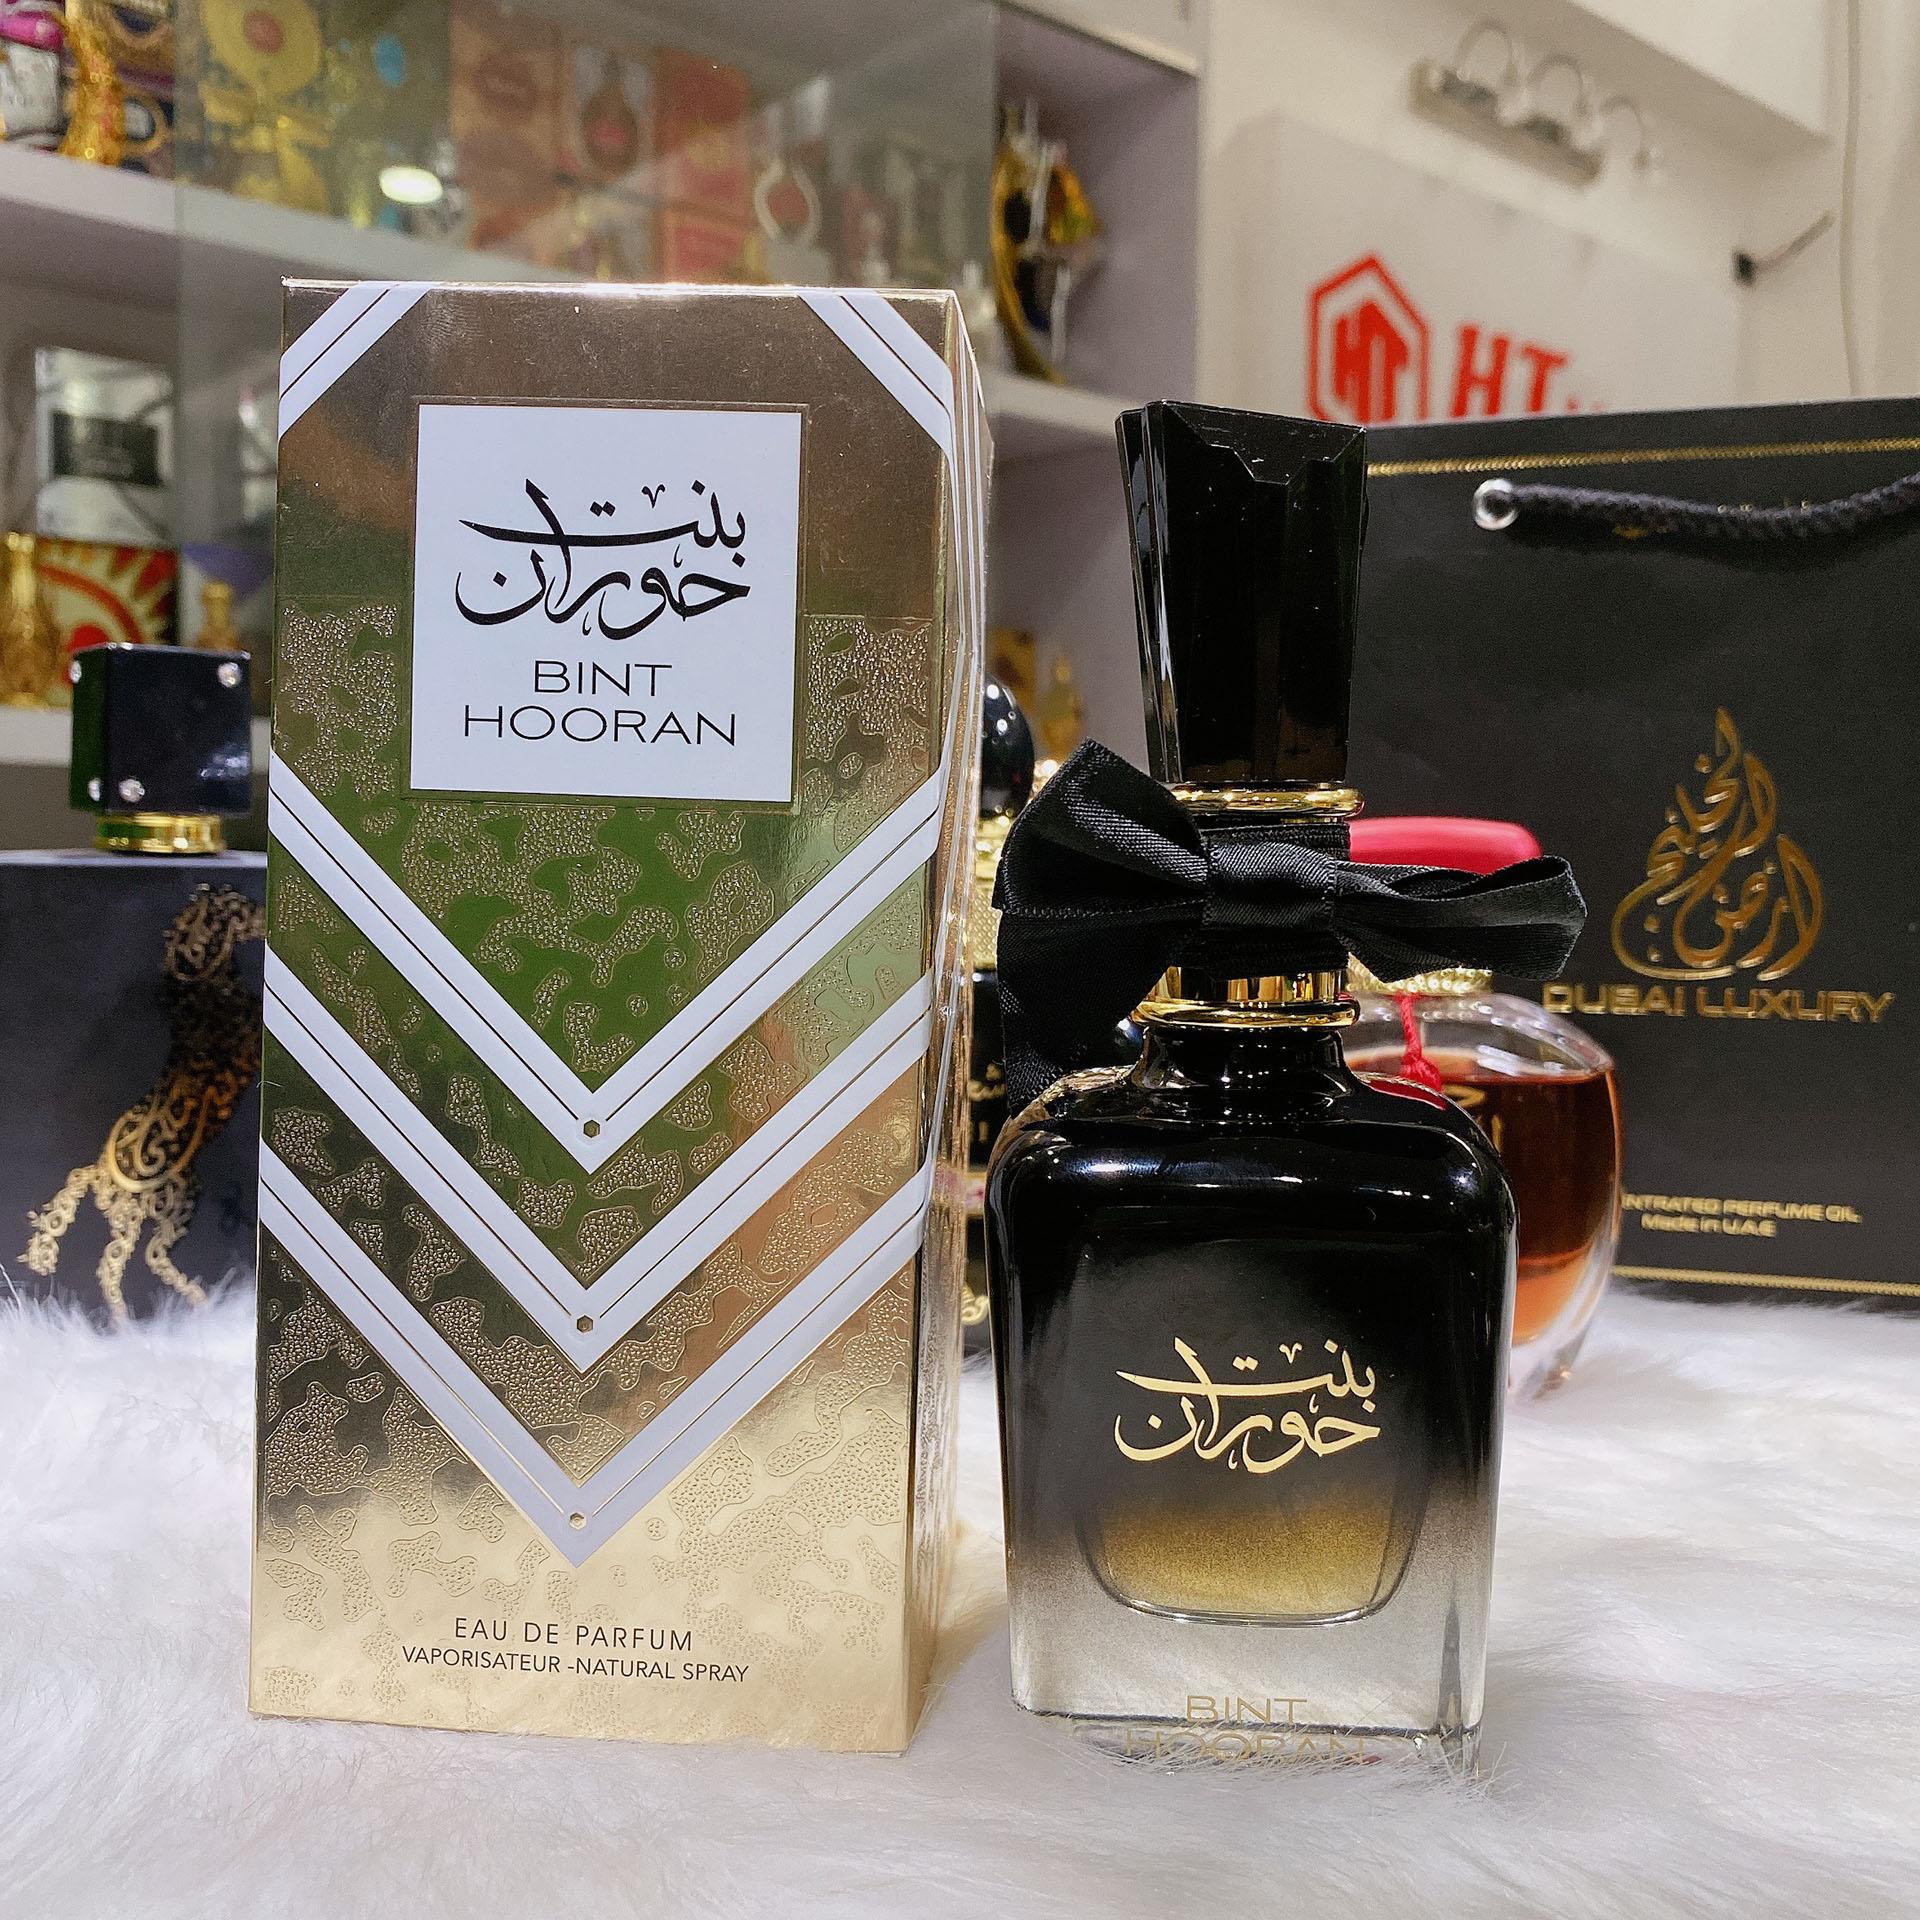 Nước hoa Dubai Bint Hooran HT Market 100ml